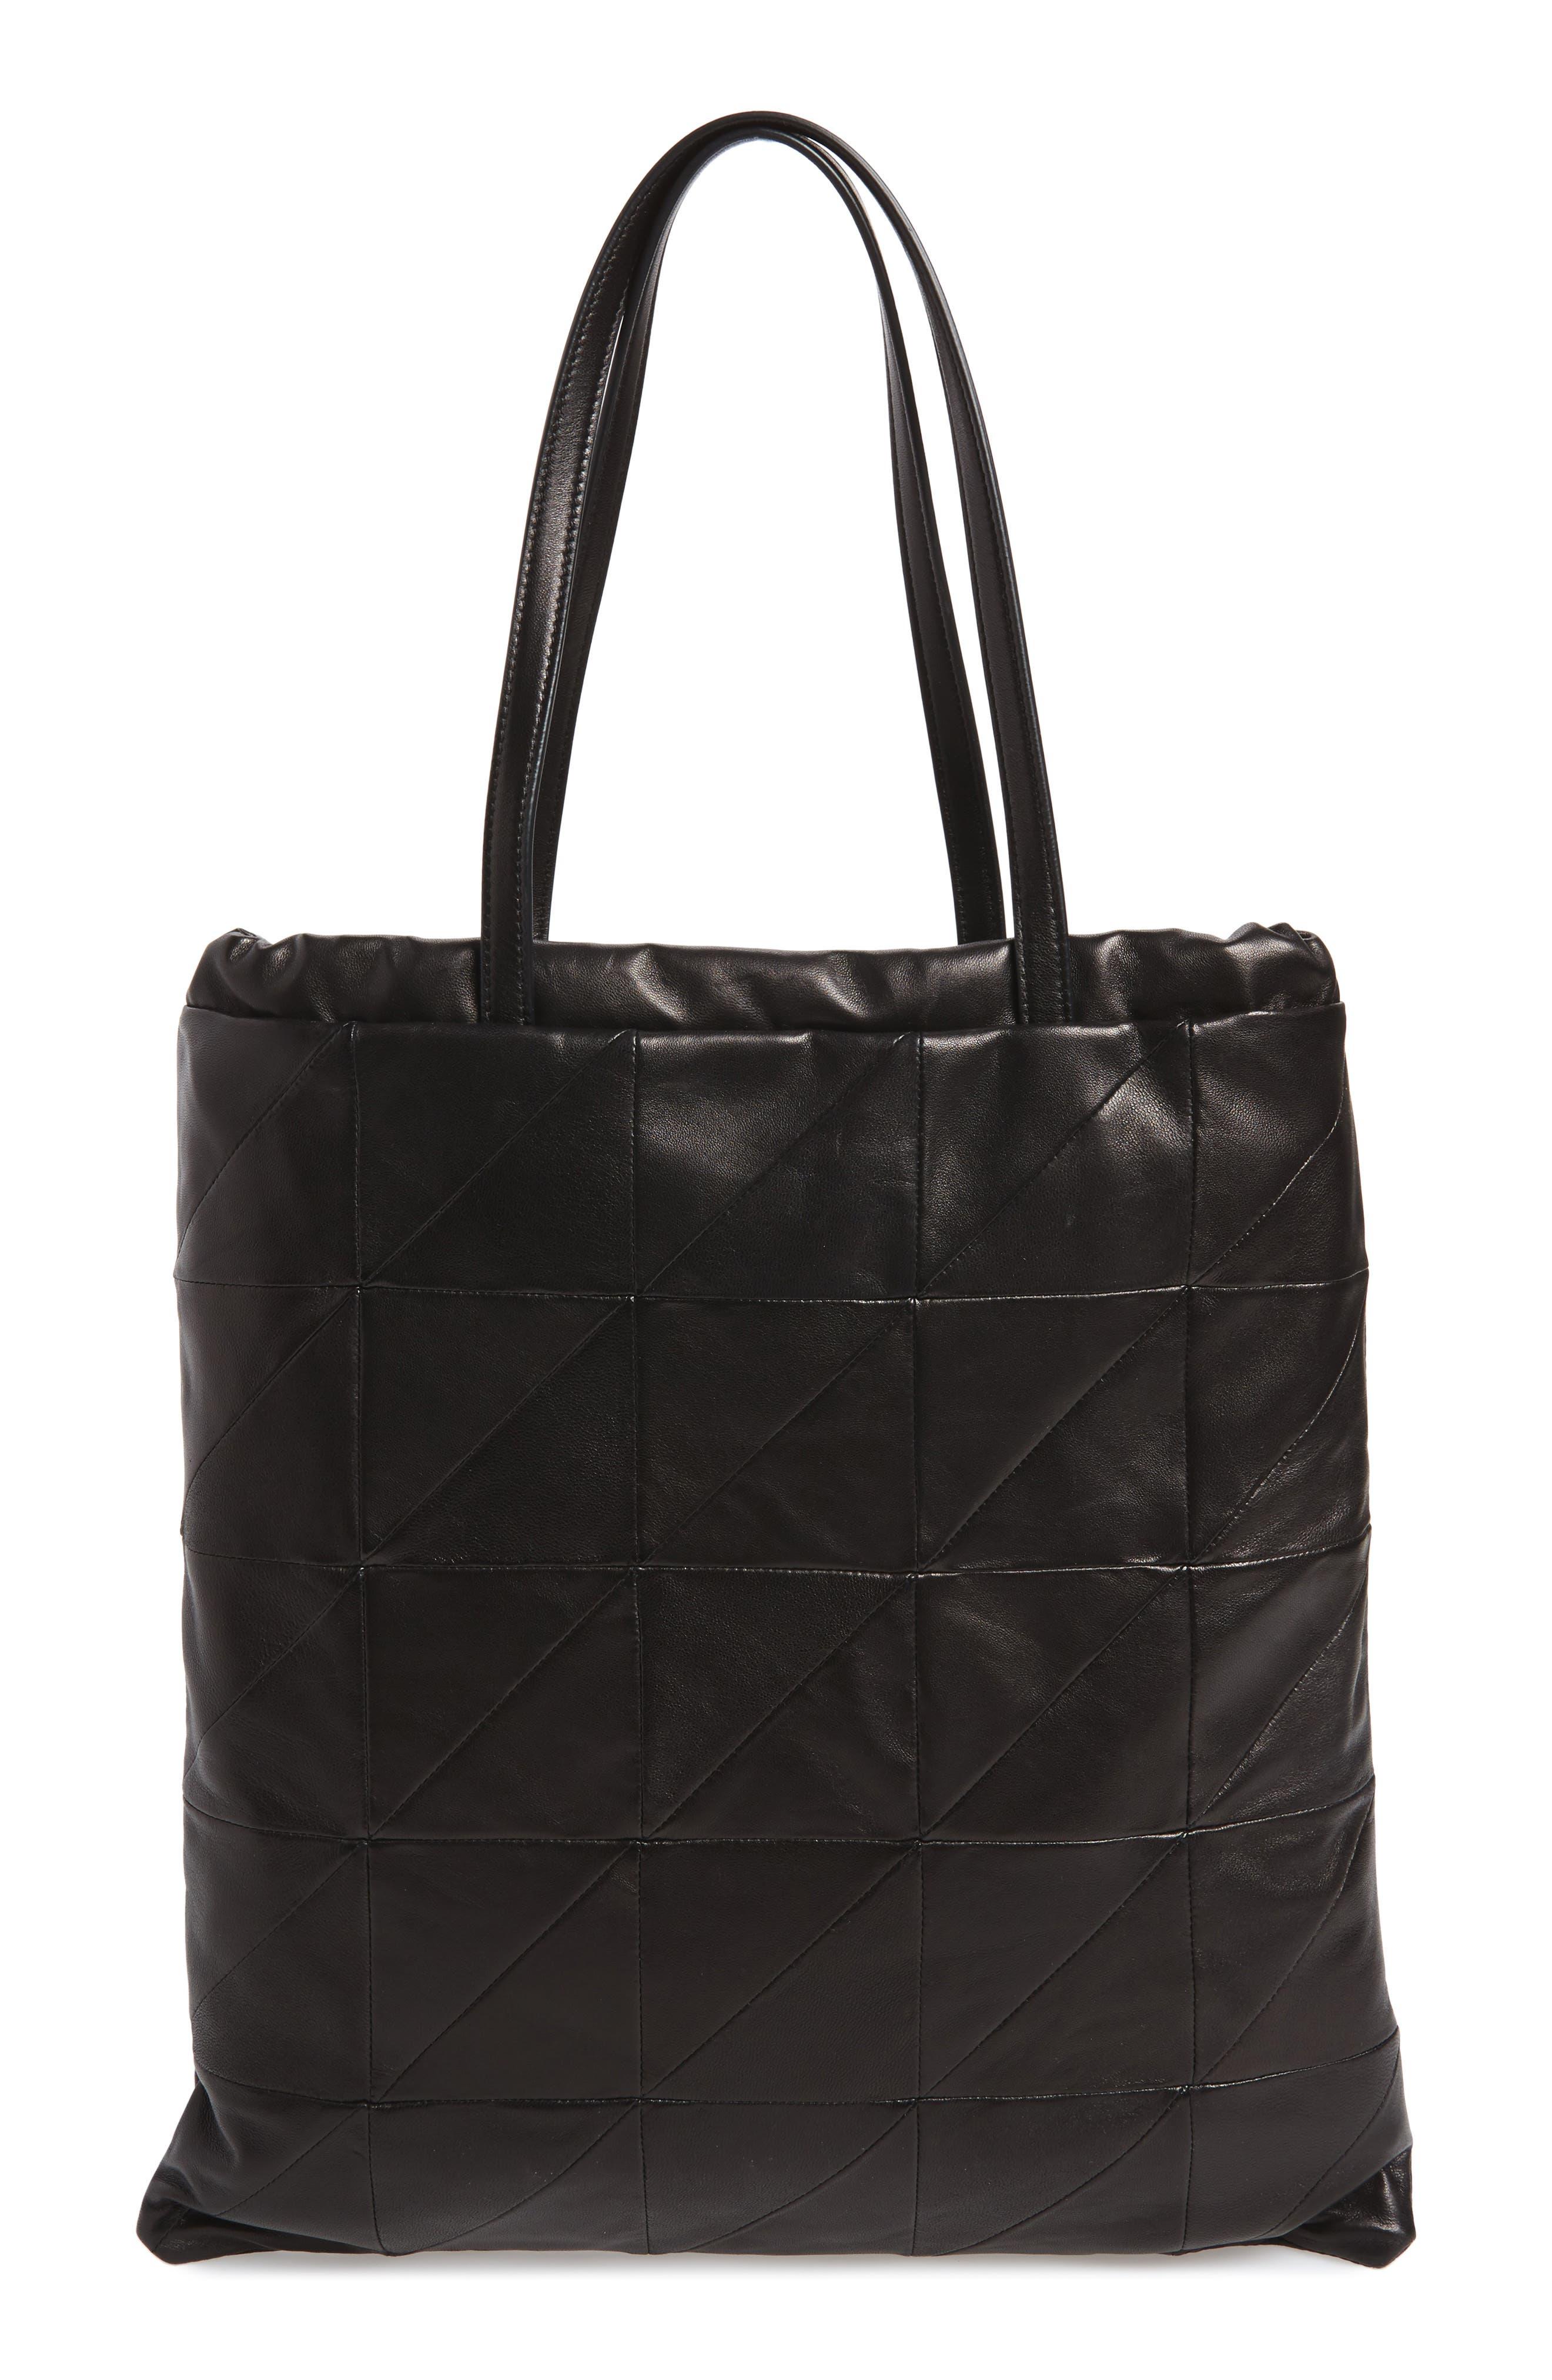 Antibe Flat Leather Shopper,                             Alternate thumbnail 3, color,                             Noir